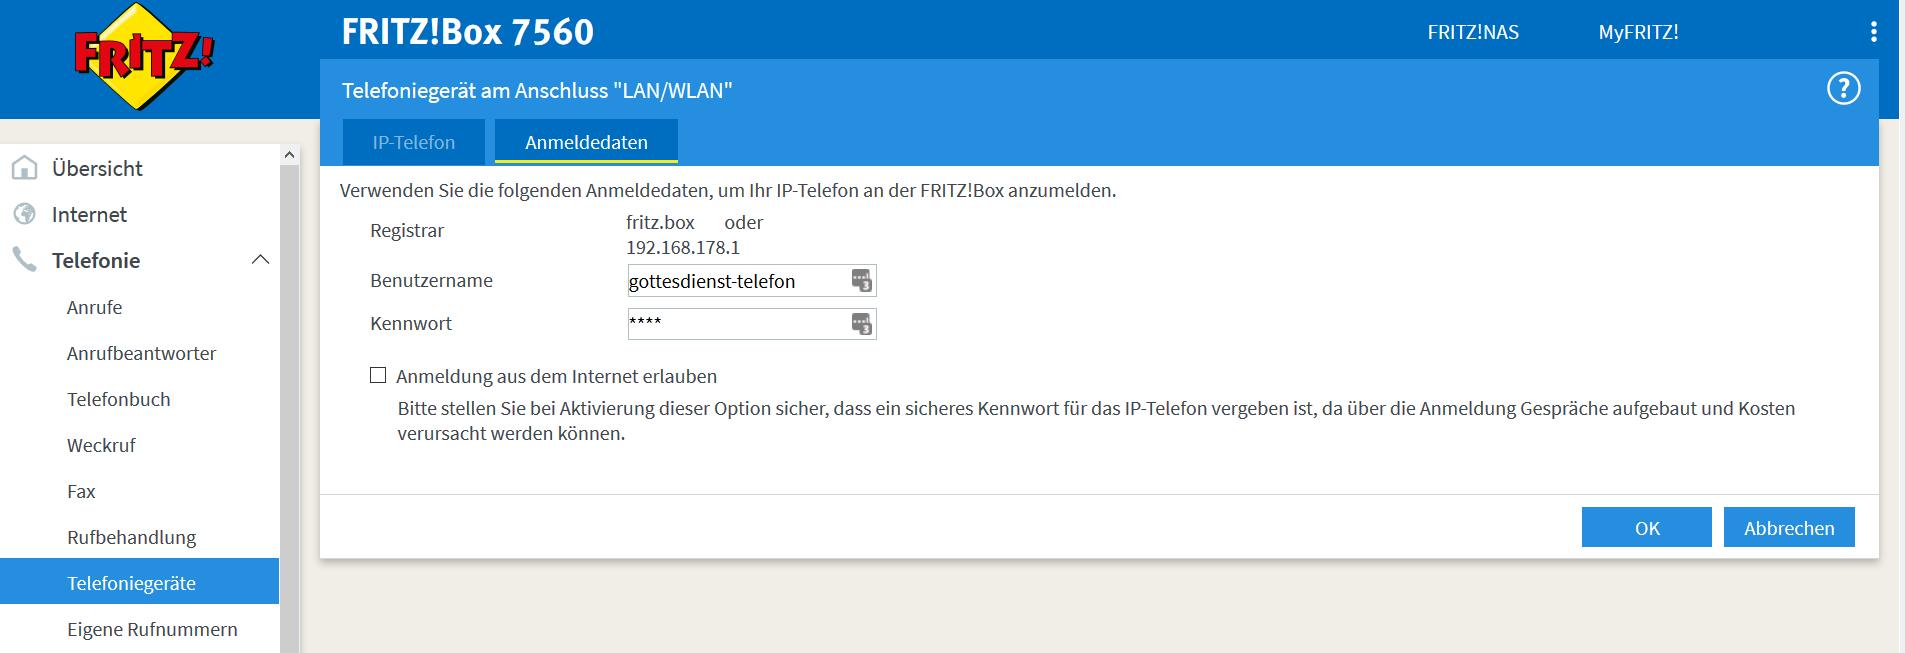 FritzBox konfigurieren 7